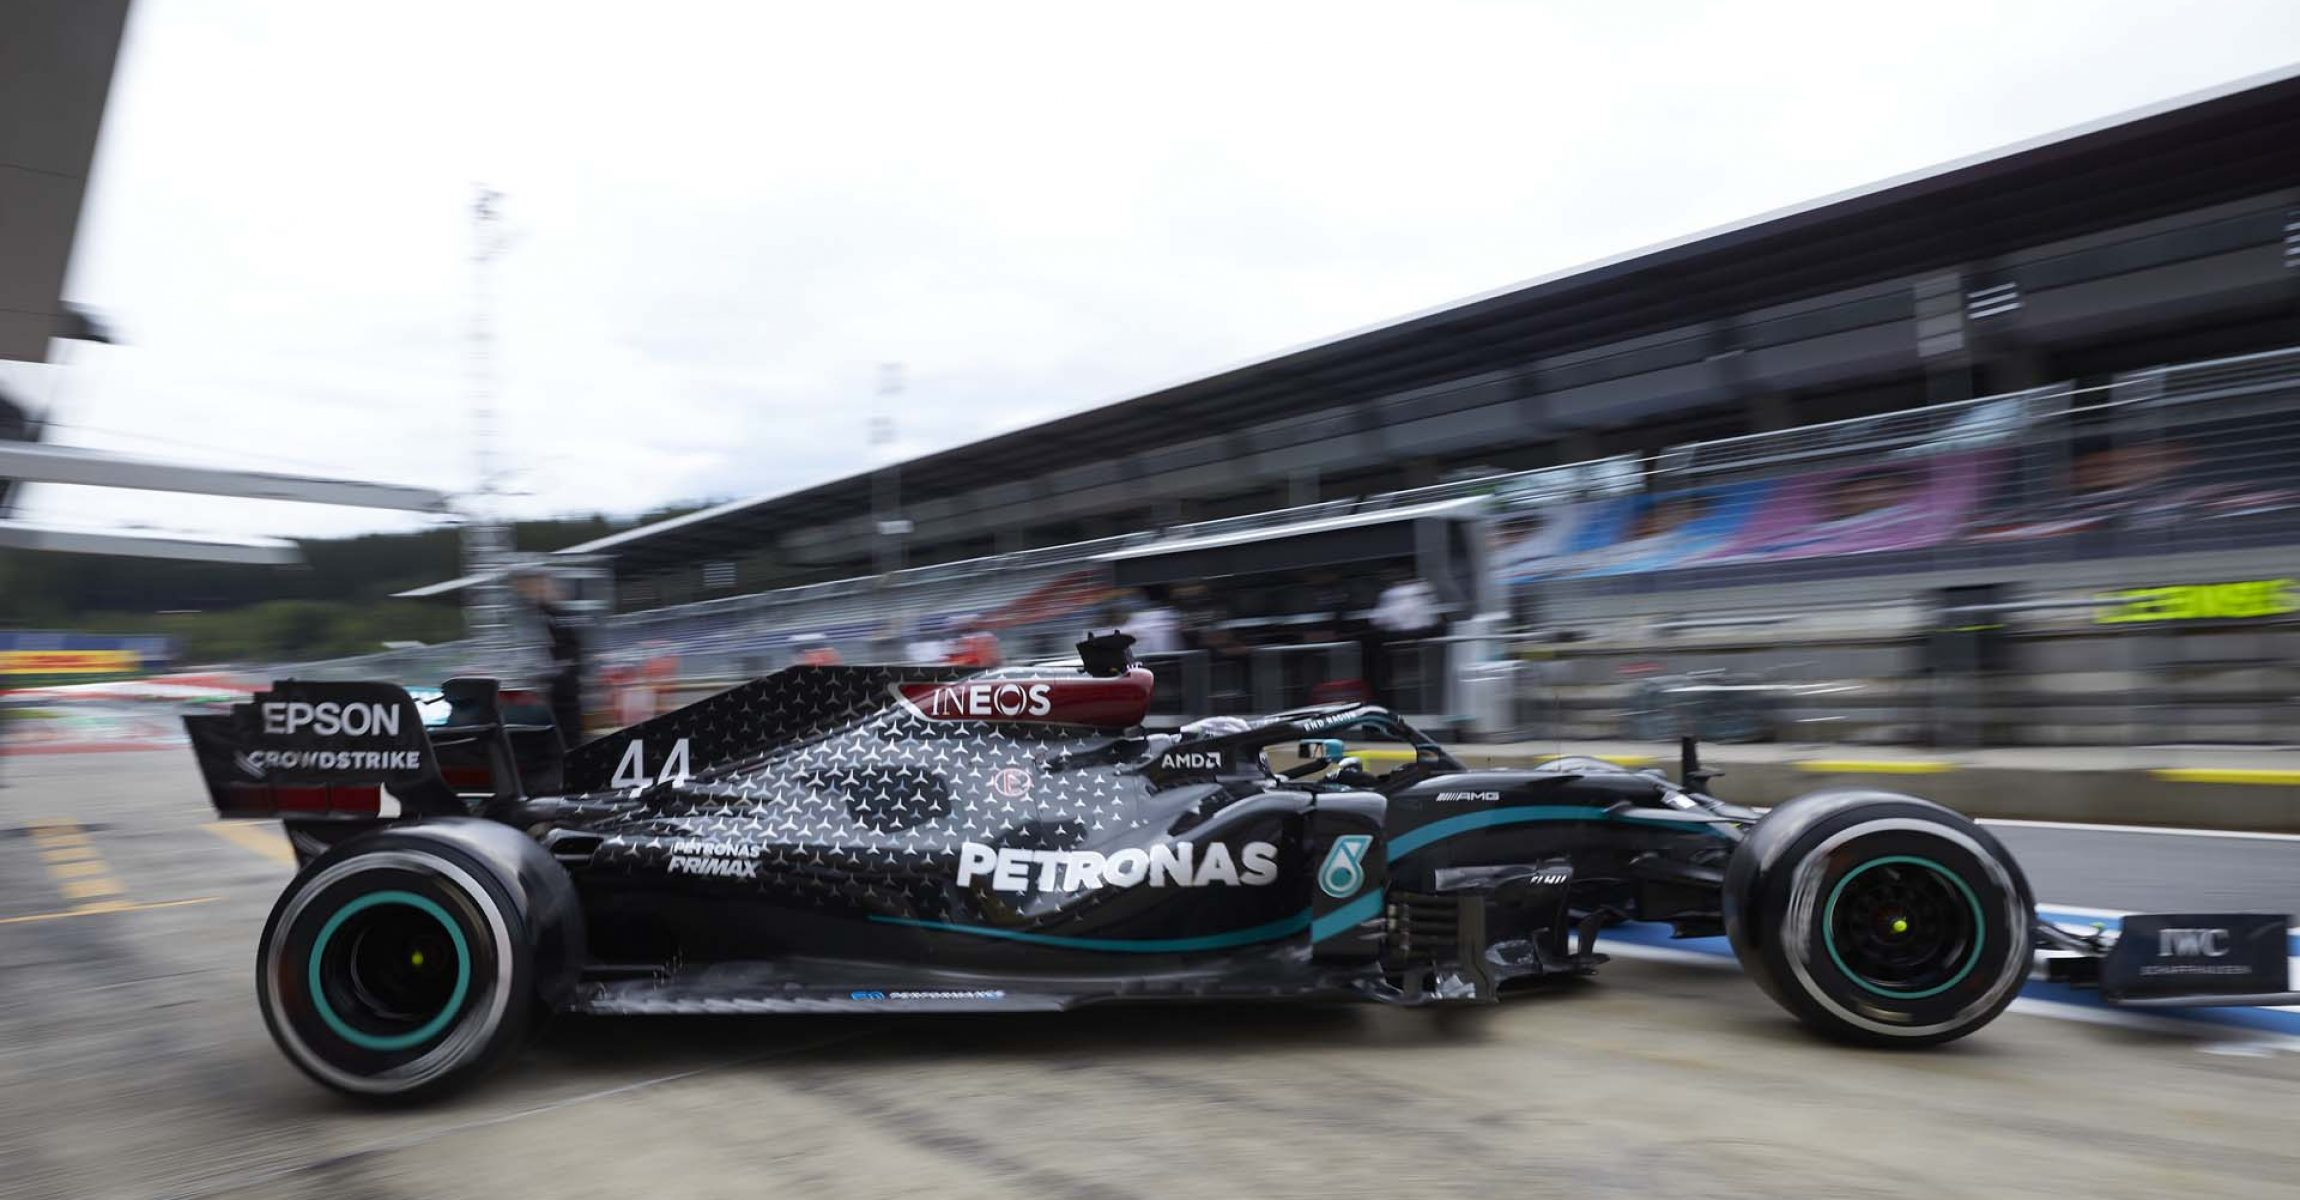 2020 Austrian Grand Prix, Friday - Steve Etherington Lewis Hamilton Mercedes